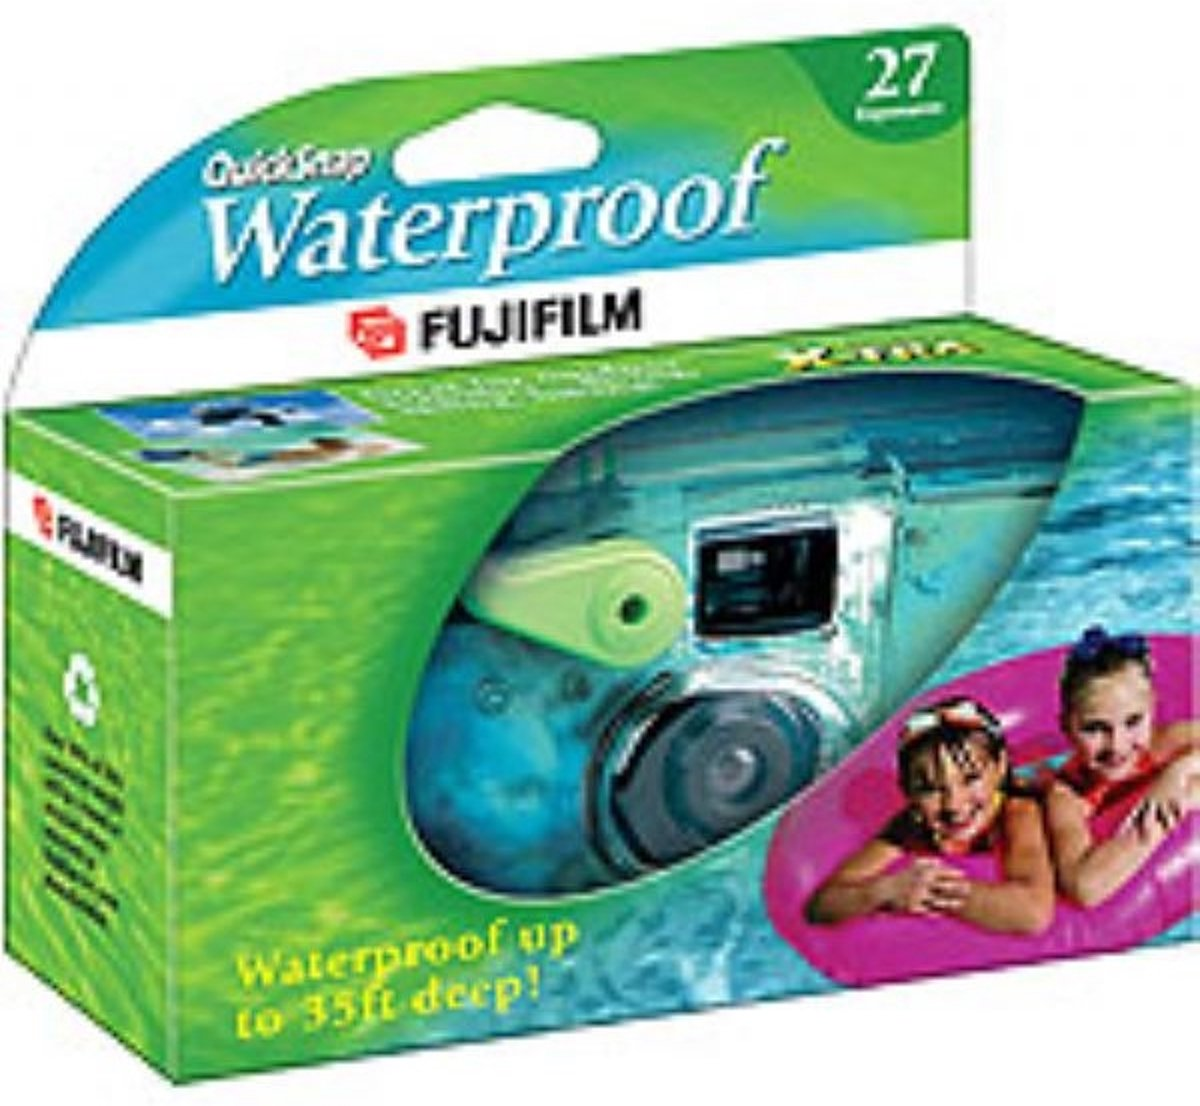 Fujifilm Quicksnap 800 Marine 27 kopen